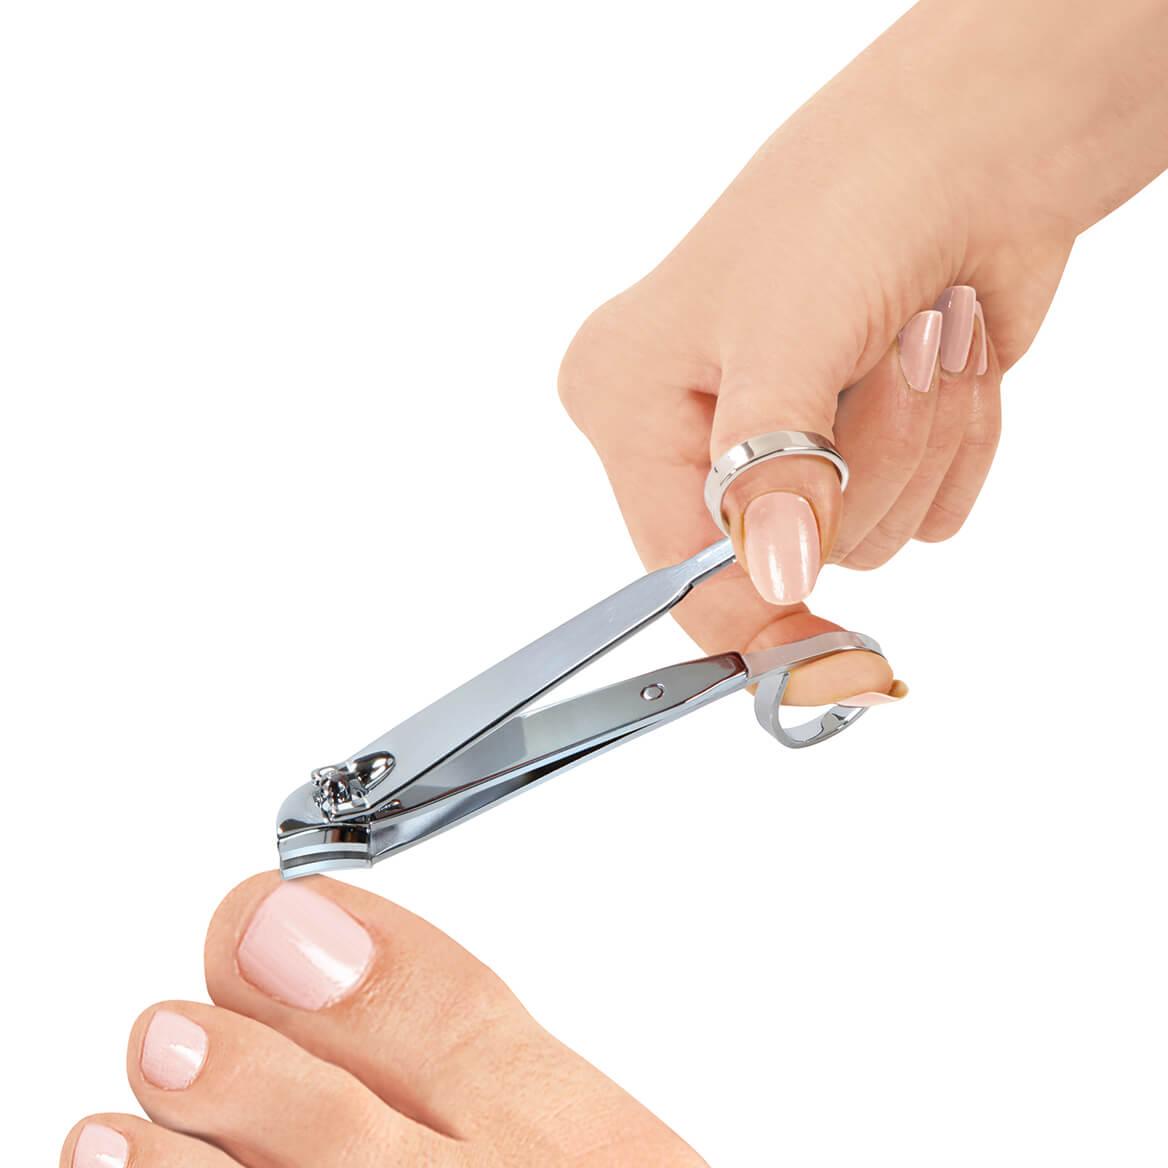 EZ Grip Side Cut Toenail Clippers-370150